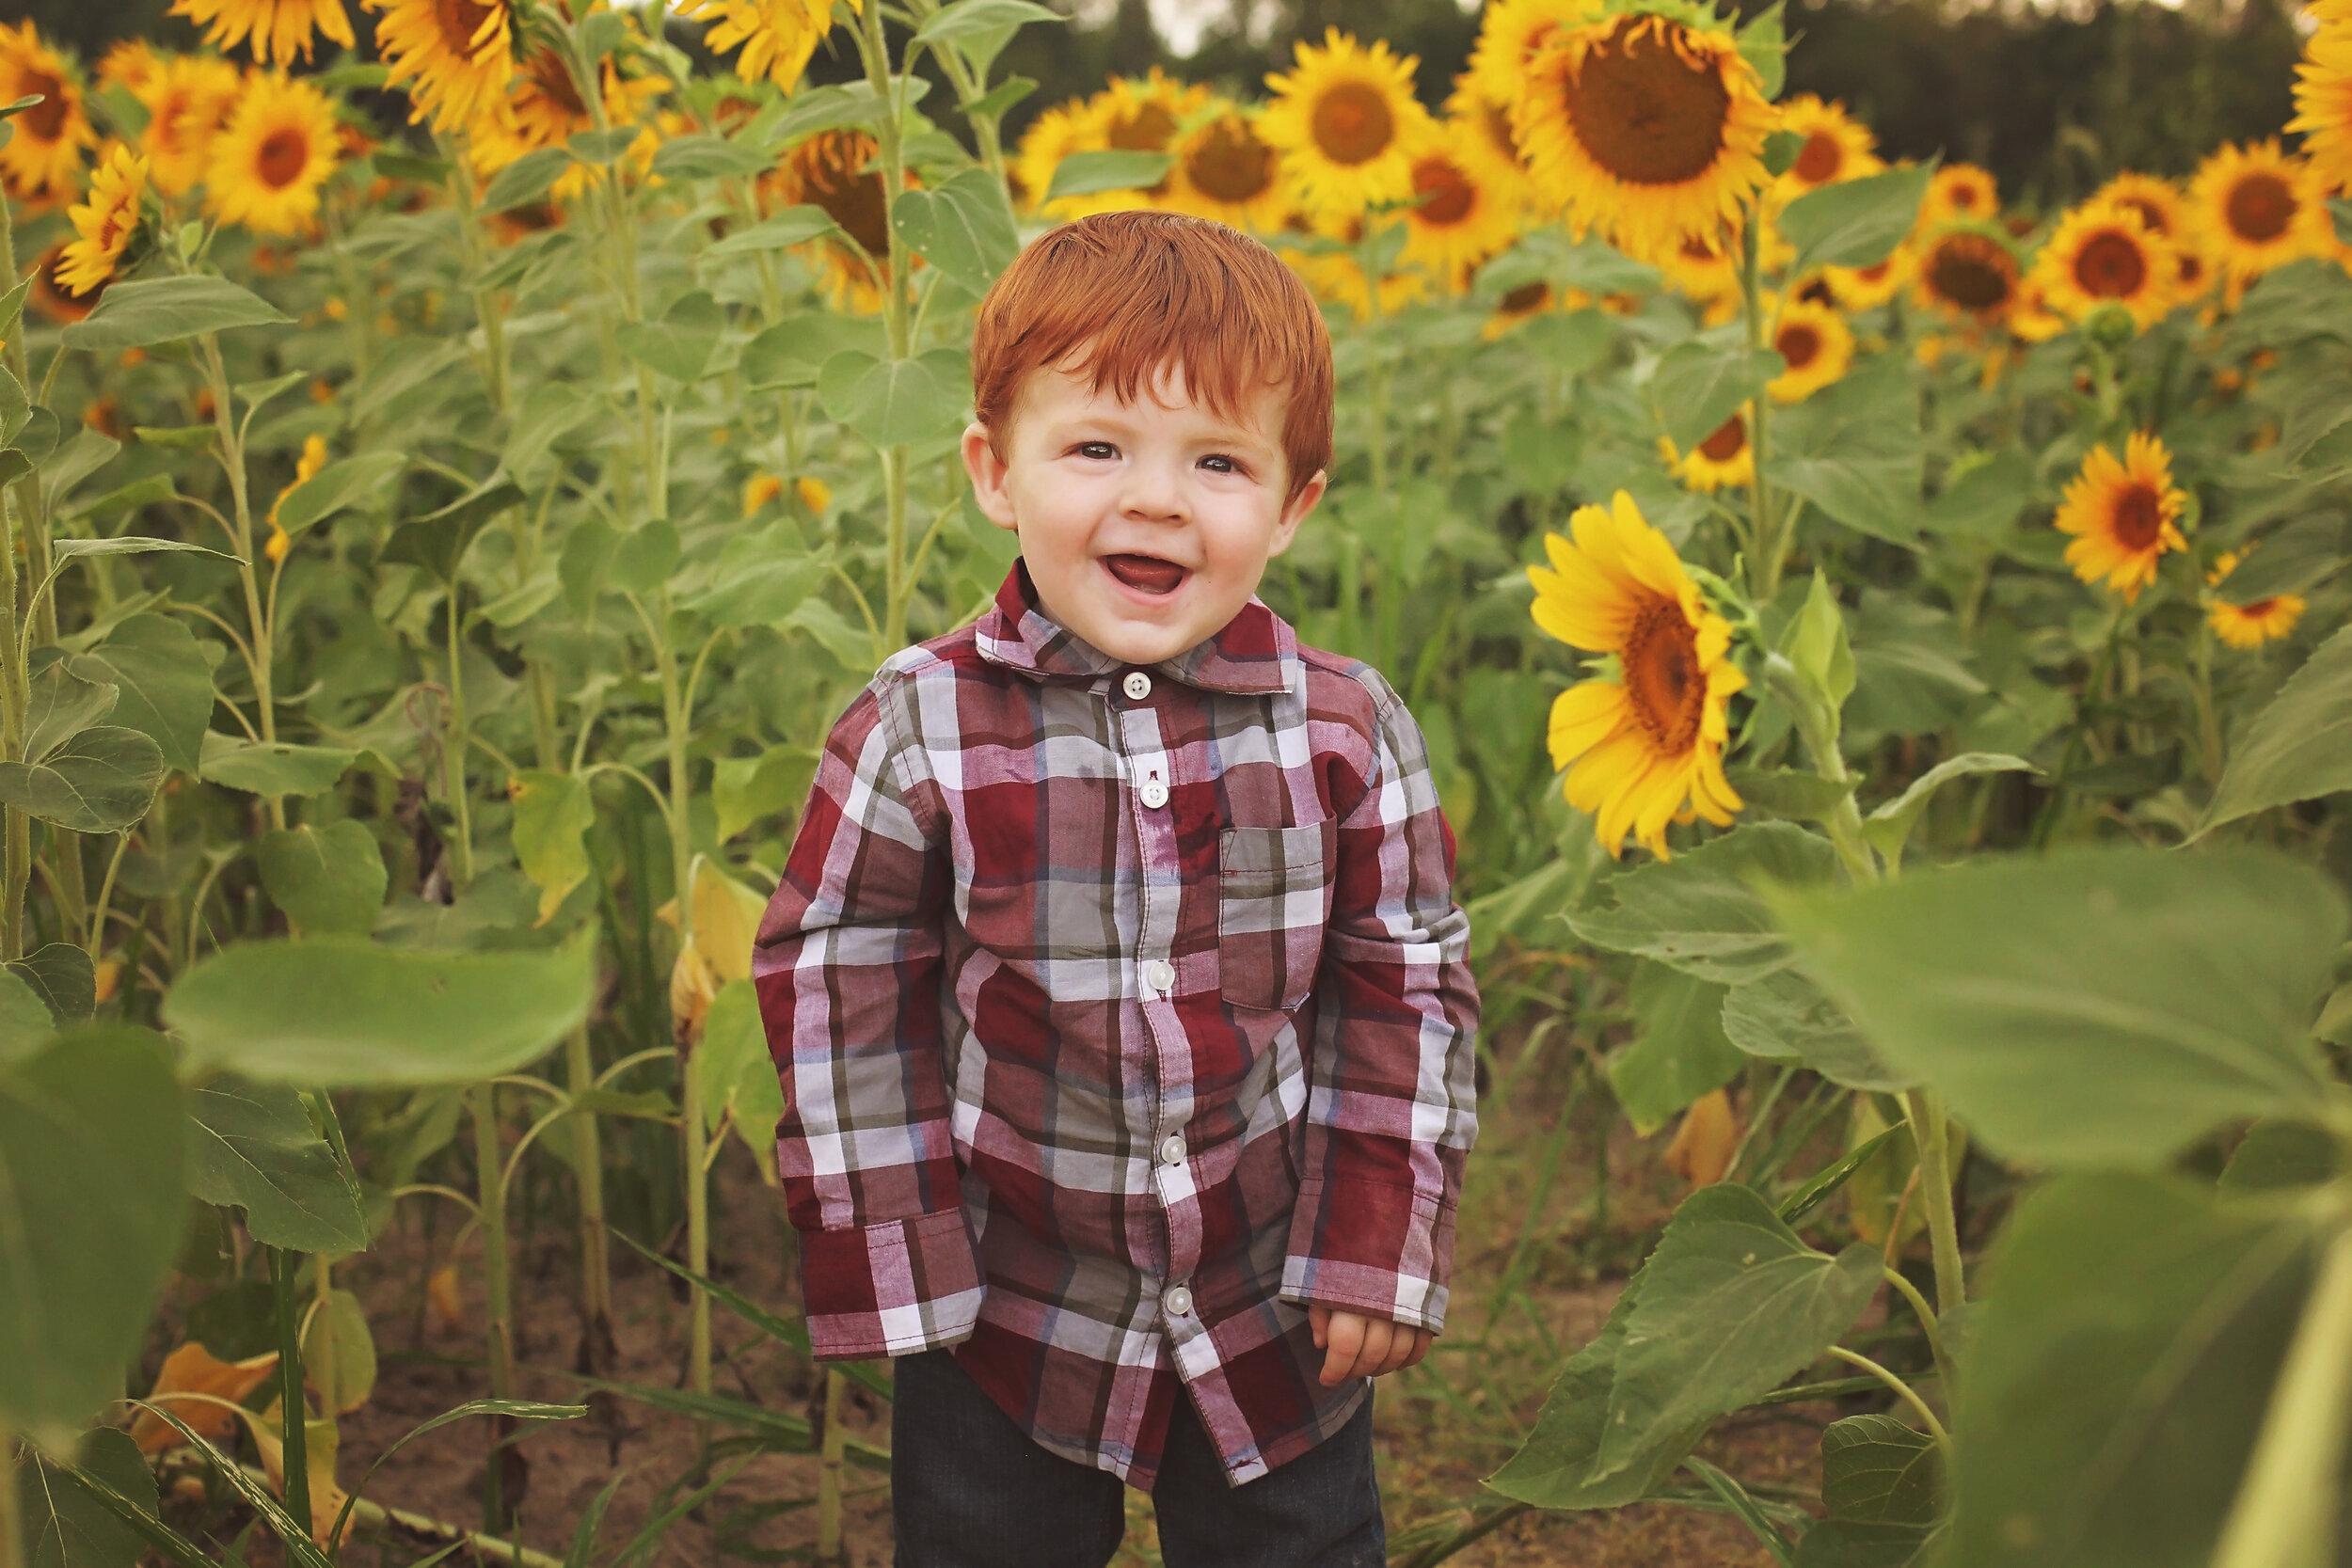 southern-illinois-photographer-benton-sunflower-field-toddler-boy-happiness.jpg